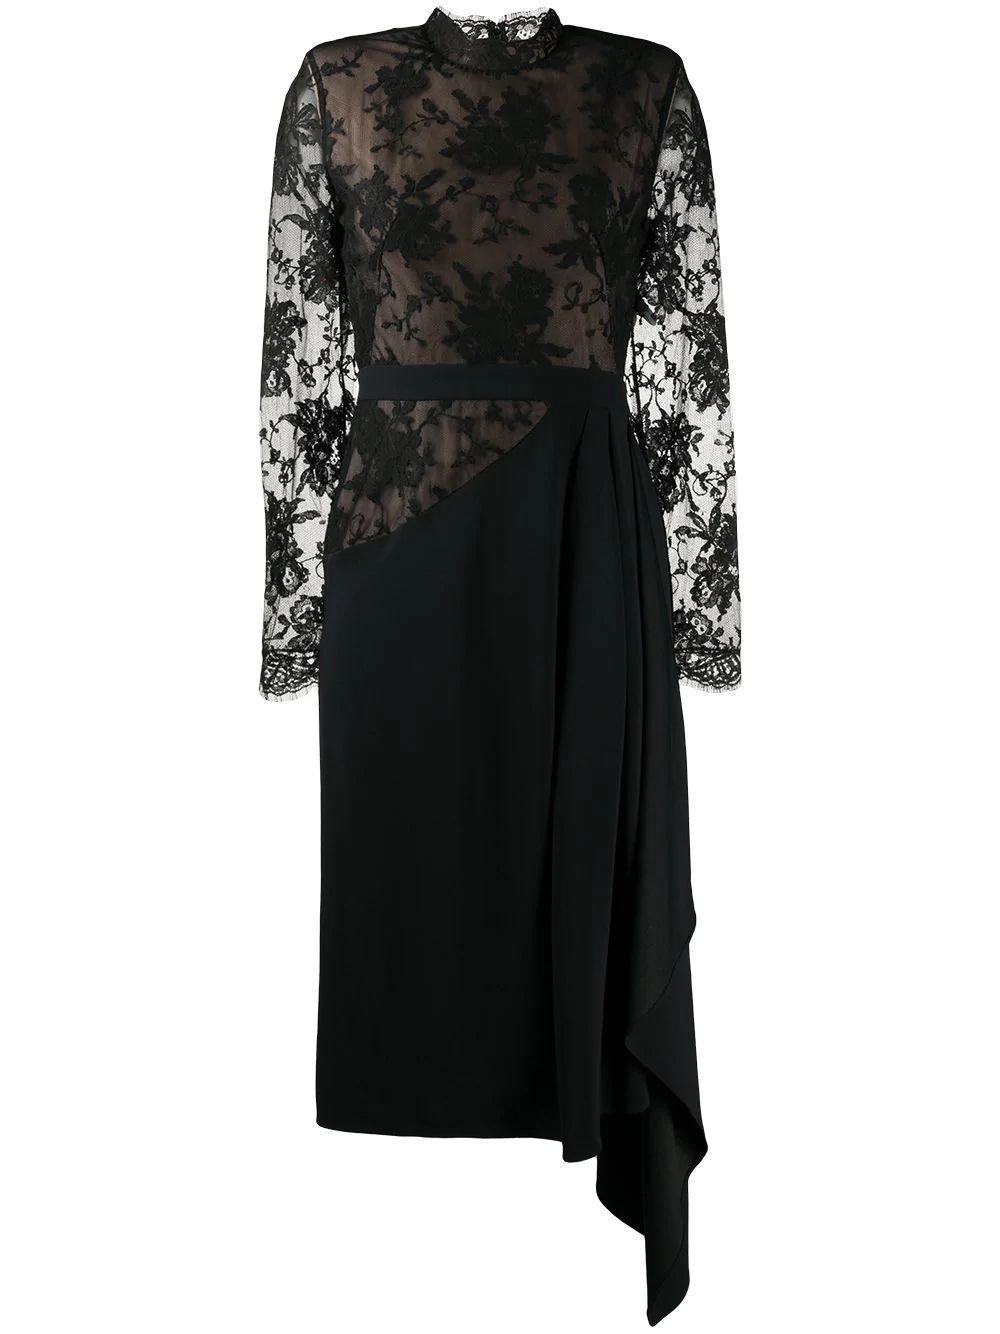 Lace Inset Asymmetrical Dress Item # 627592QEAAA